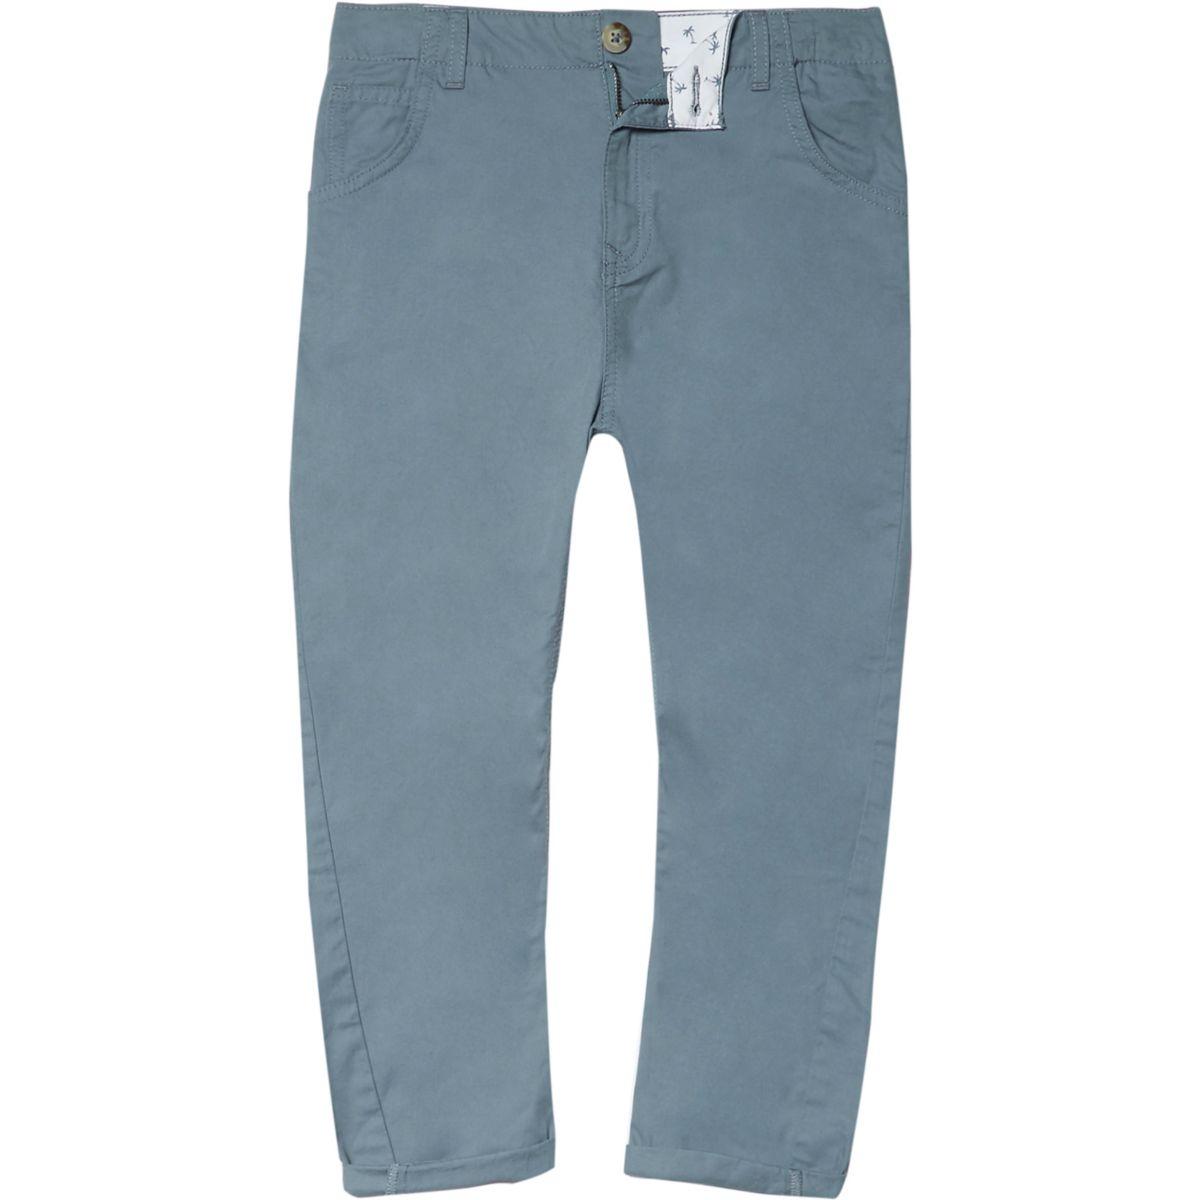 Boys light blue tapered chino pants